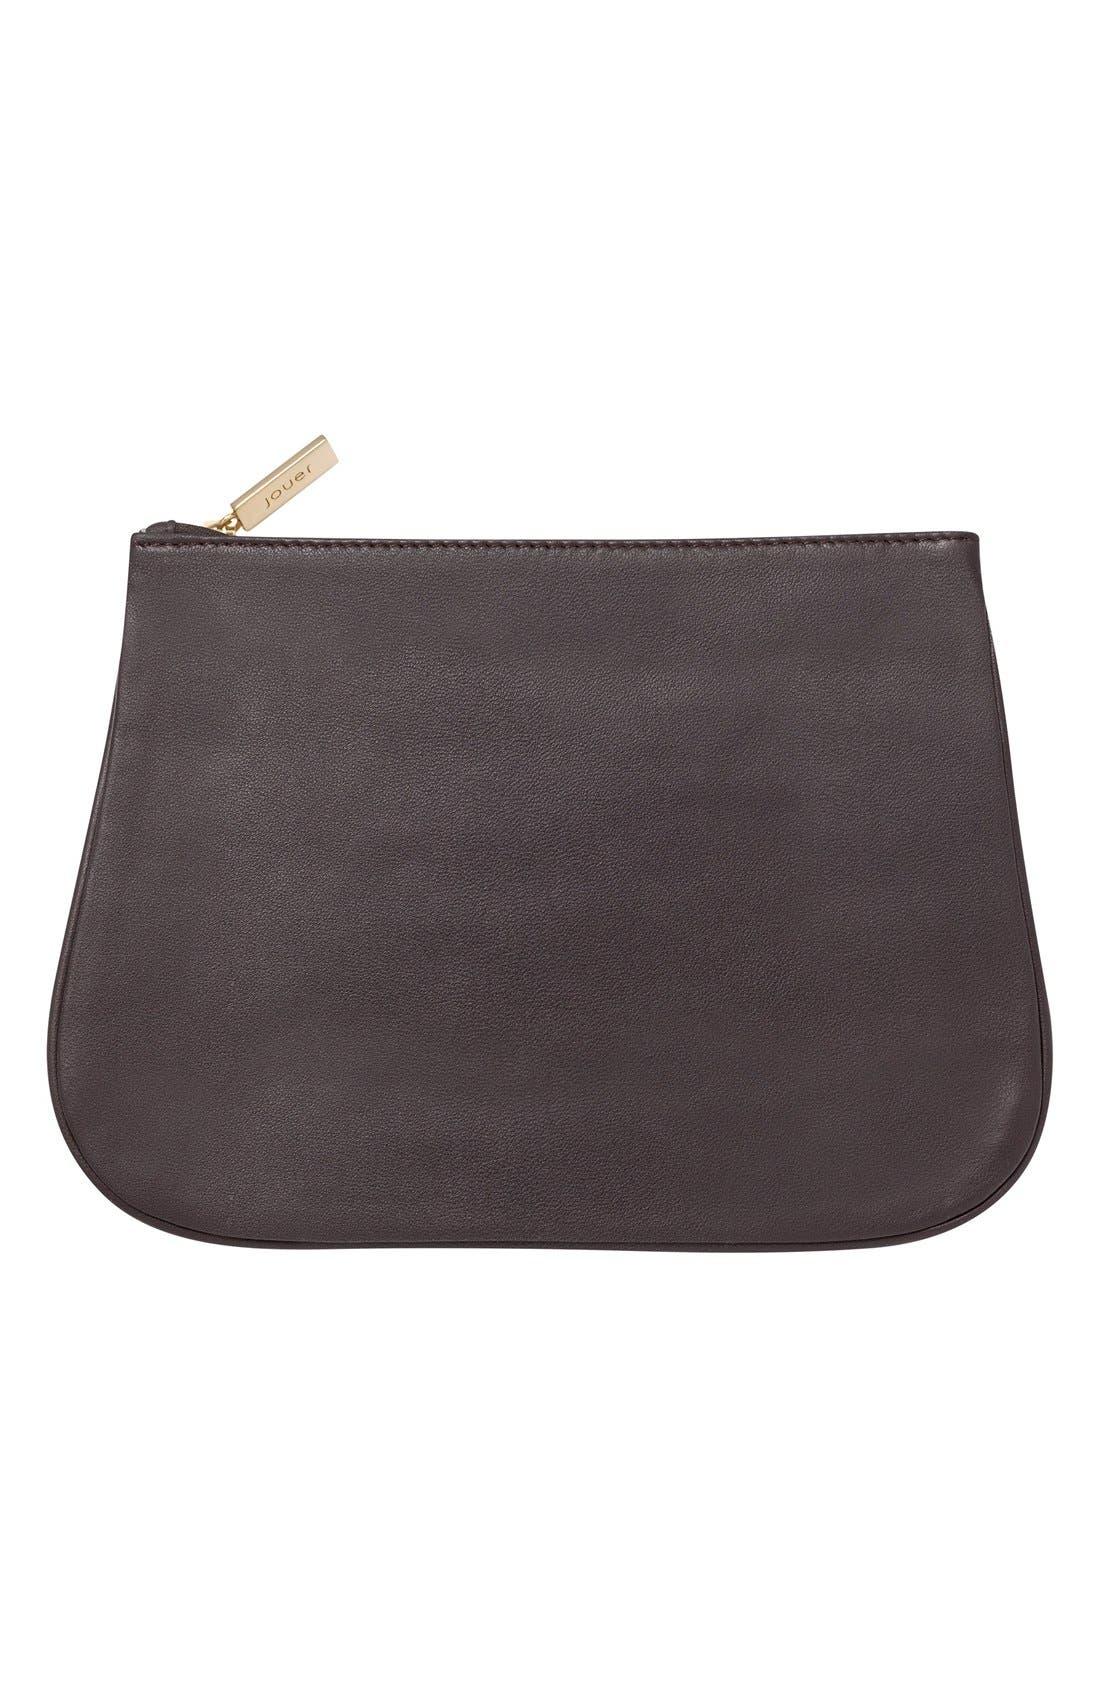 'IT - Chocolate' Cosmetics Bag,                             Main thumbnail 1, color,                             200